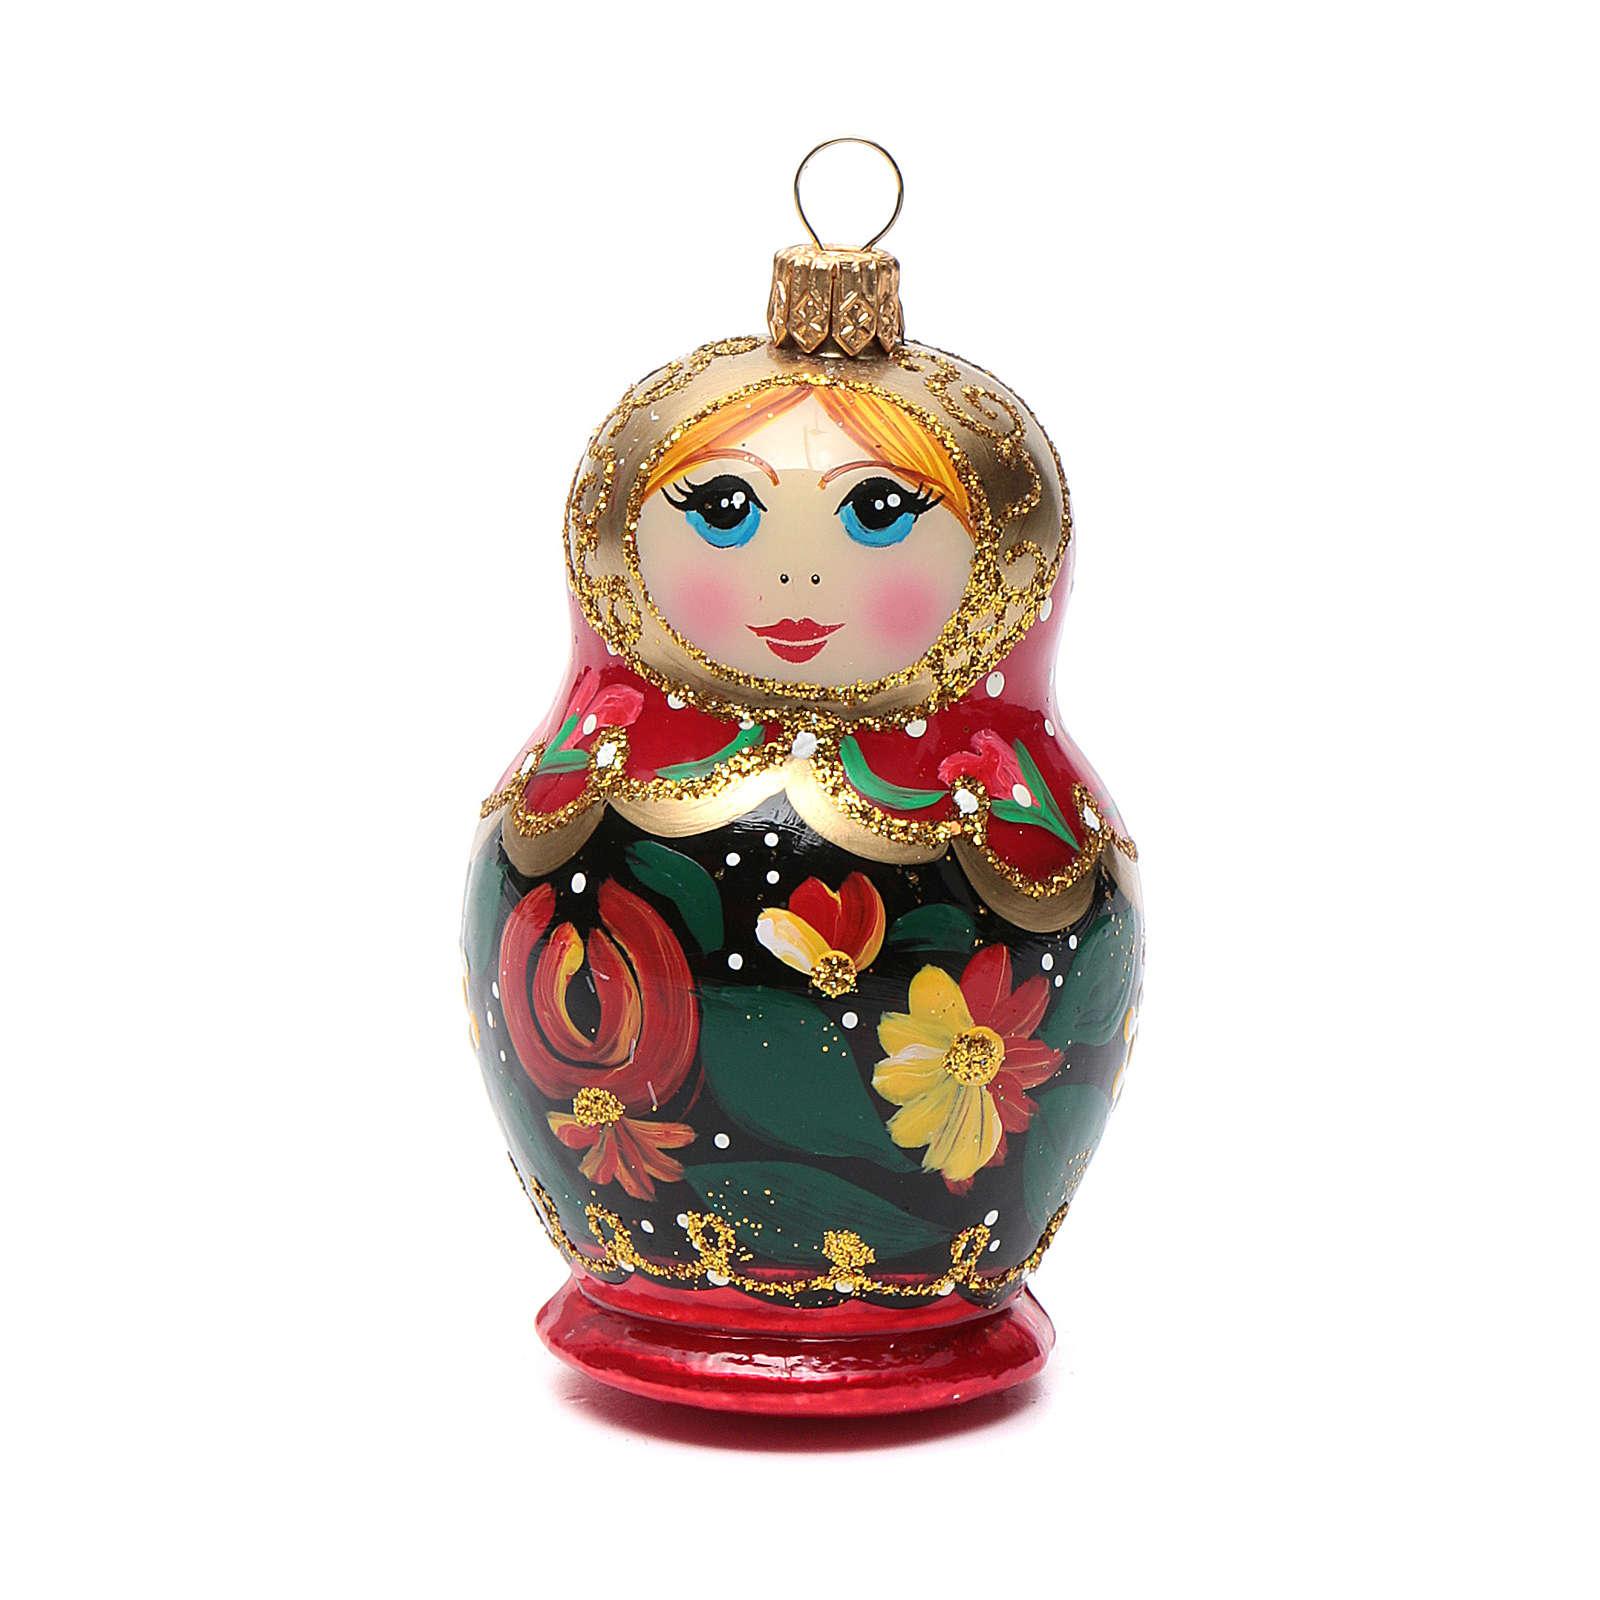 Blown glass Christmas ornament, matryoshka 4